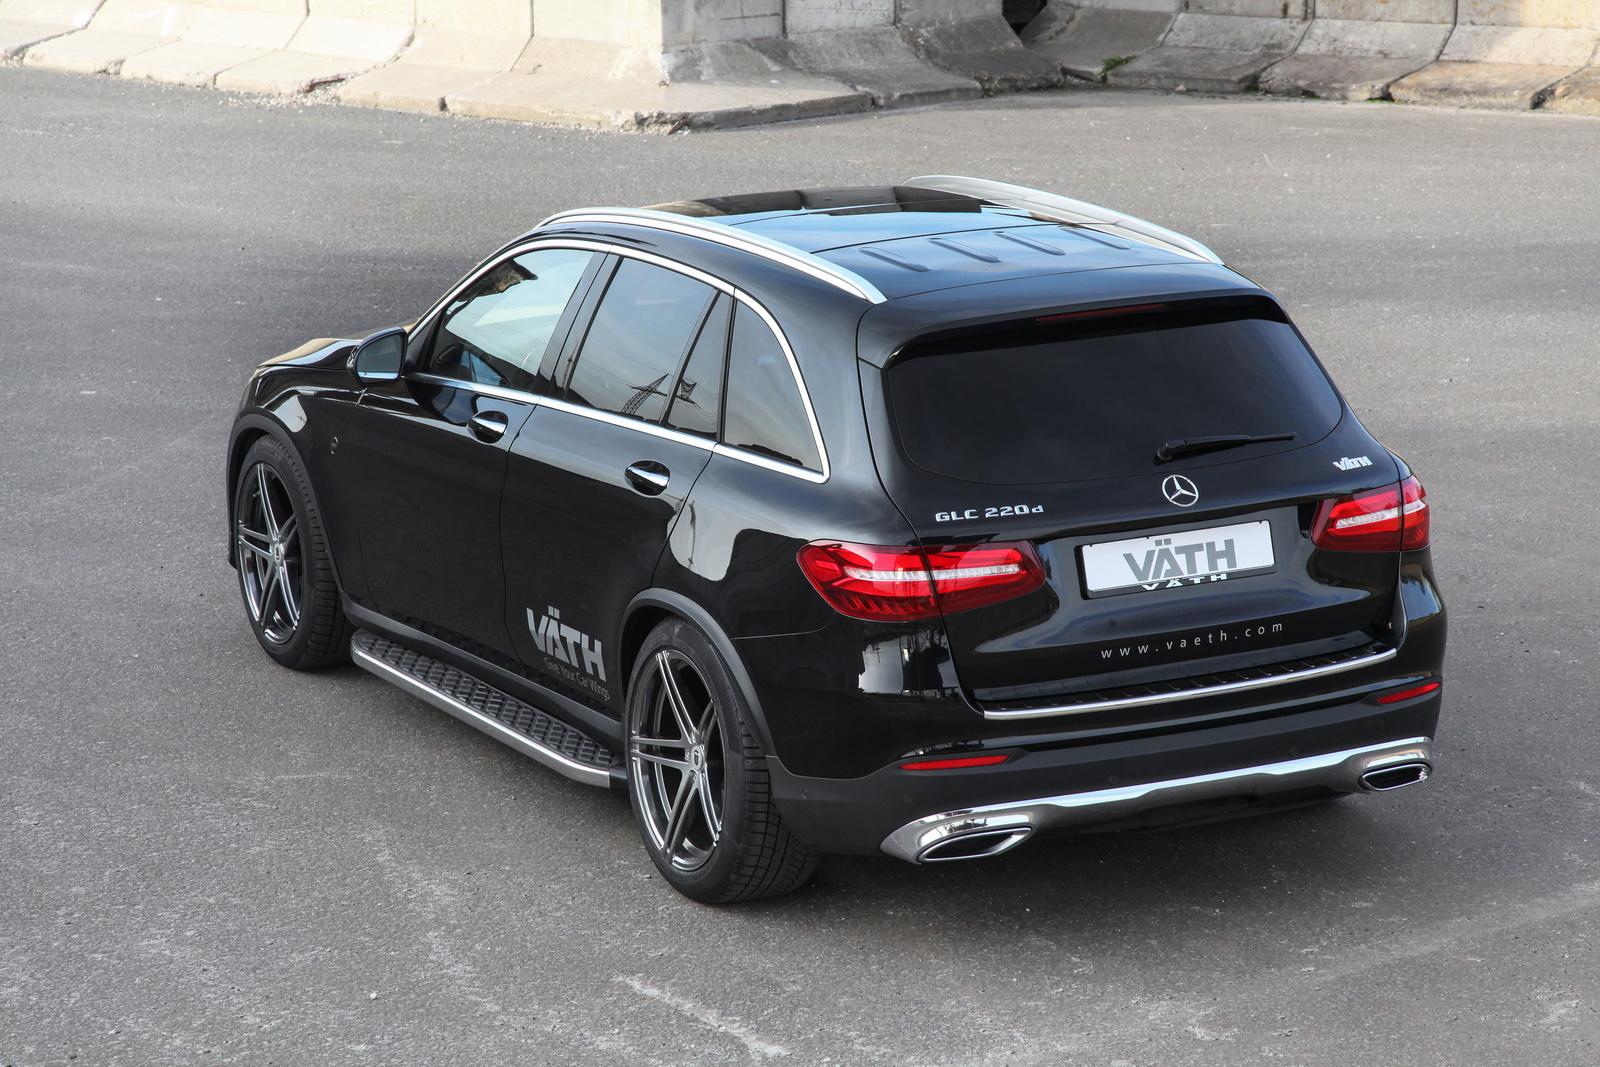 Mercedes_GLC220d_by_Vath_10